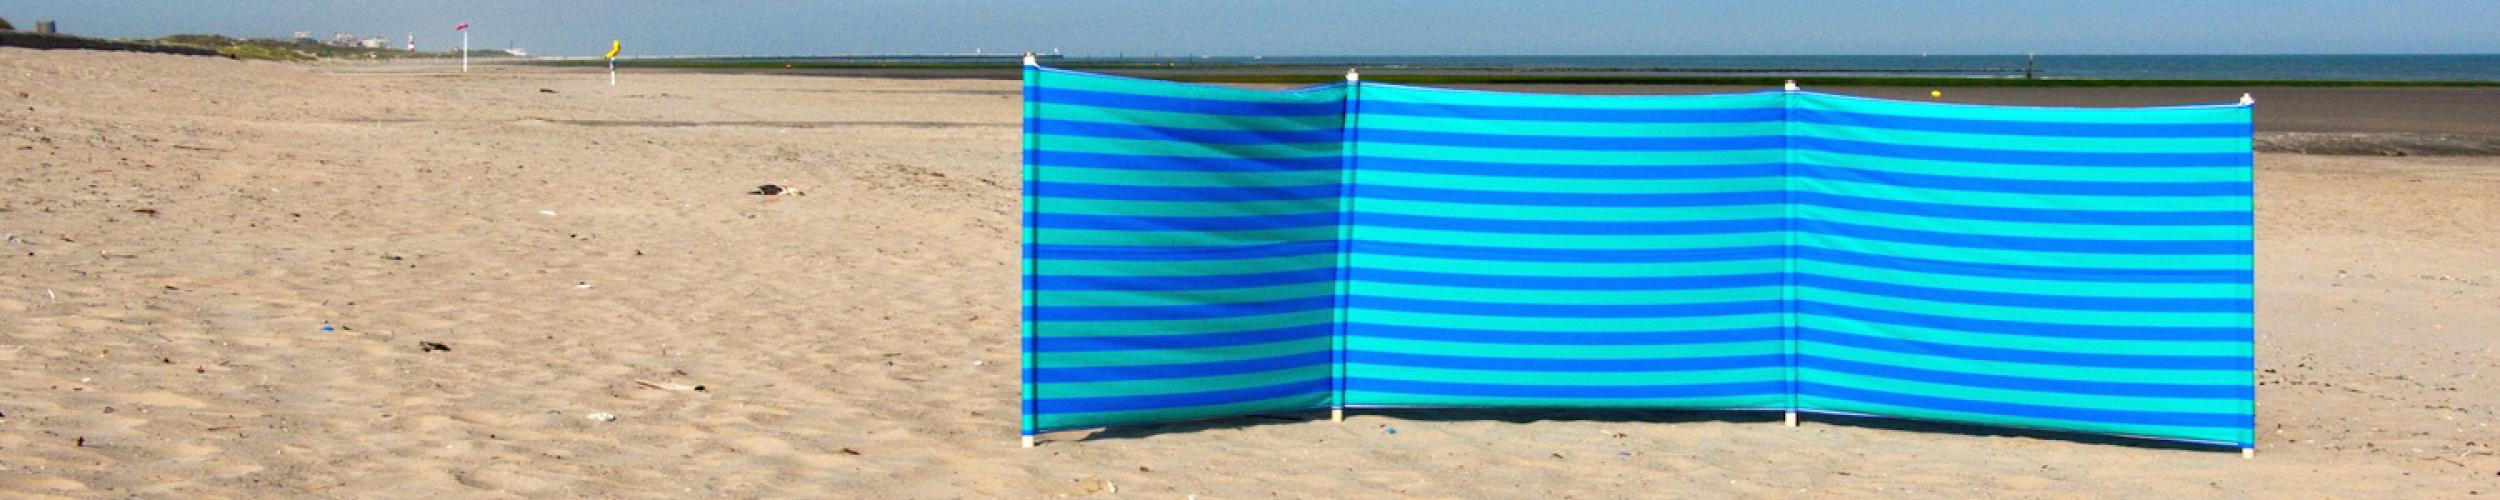 windschermen en strandschermen Avalo